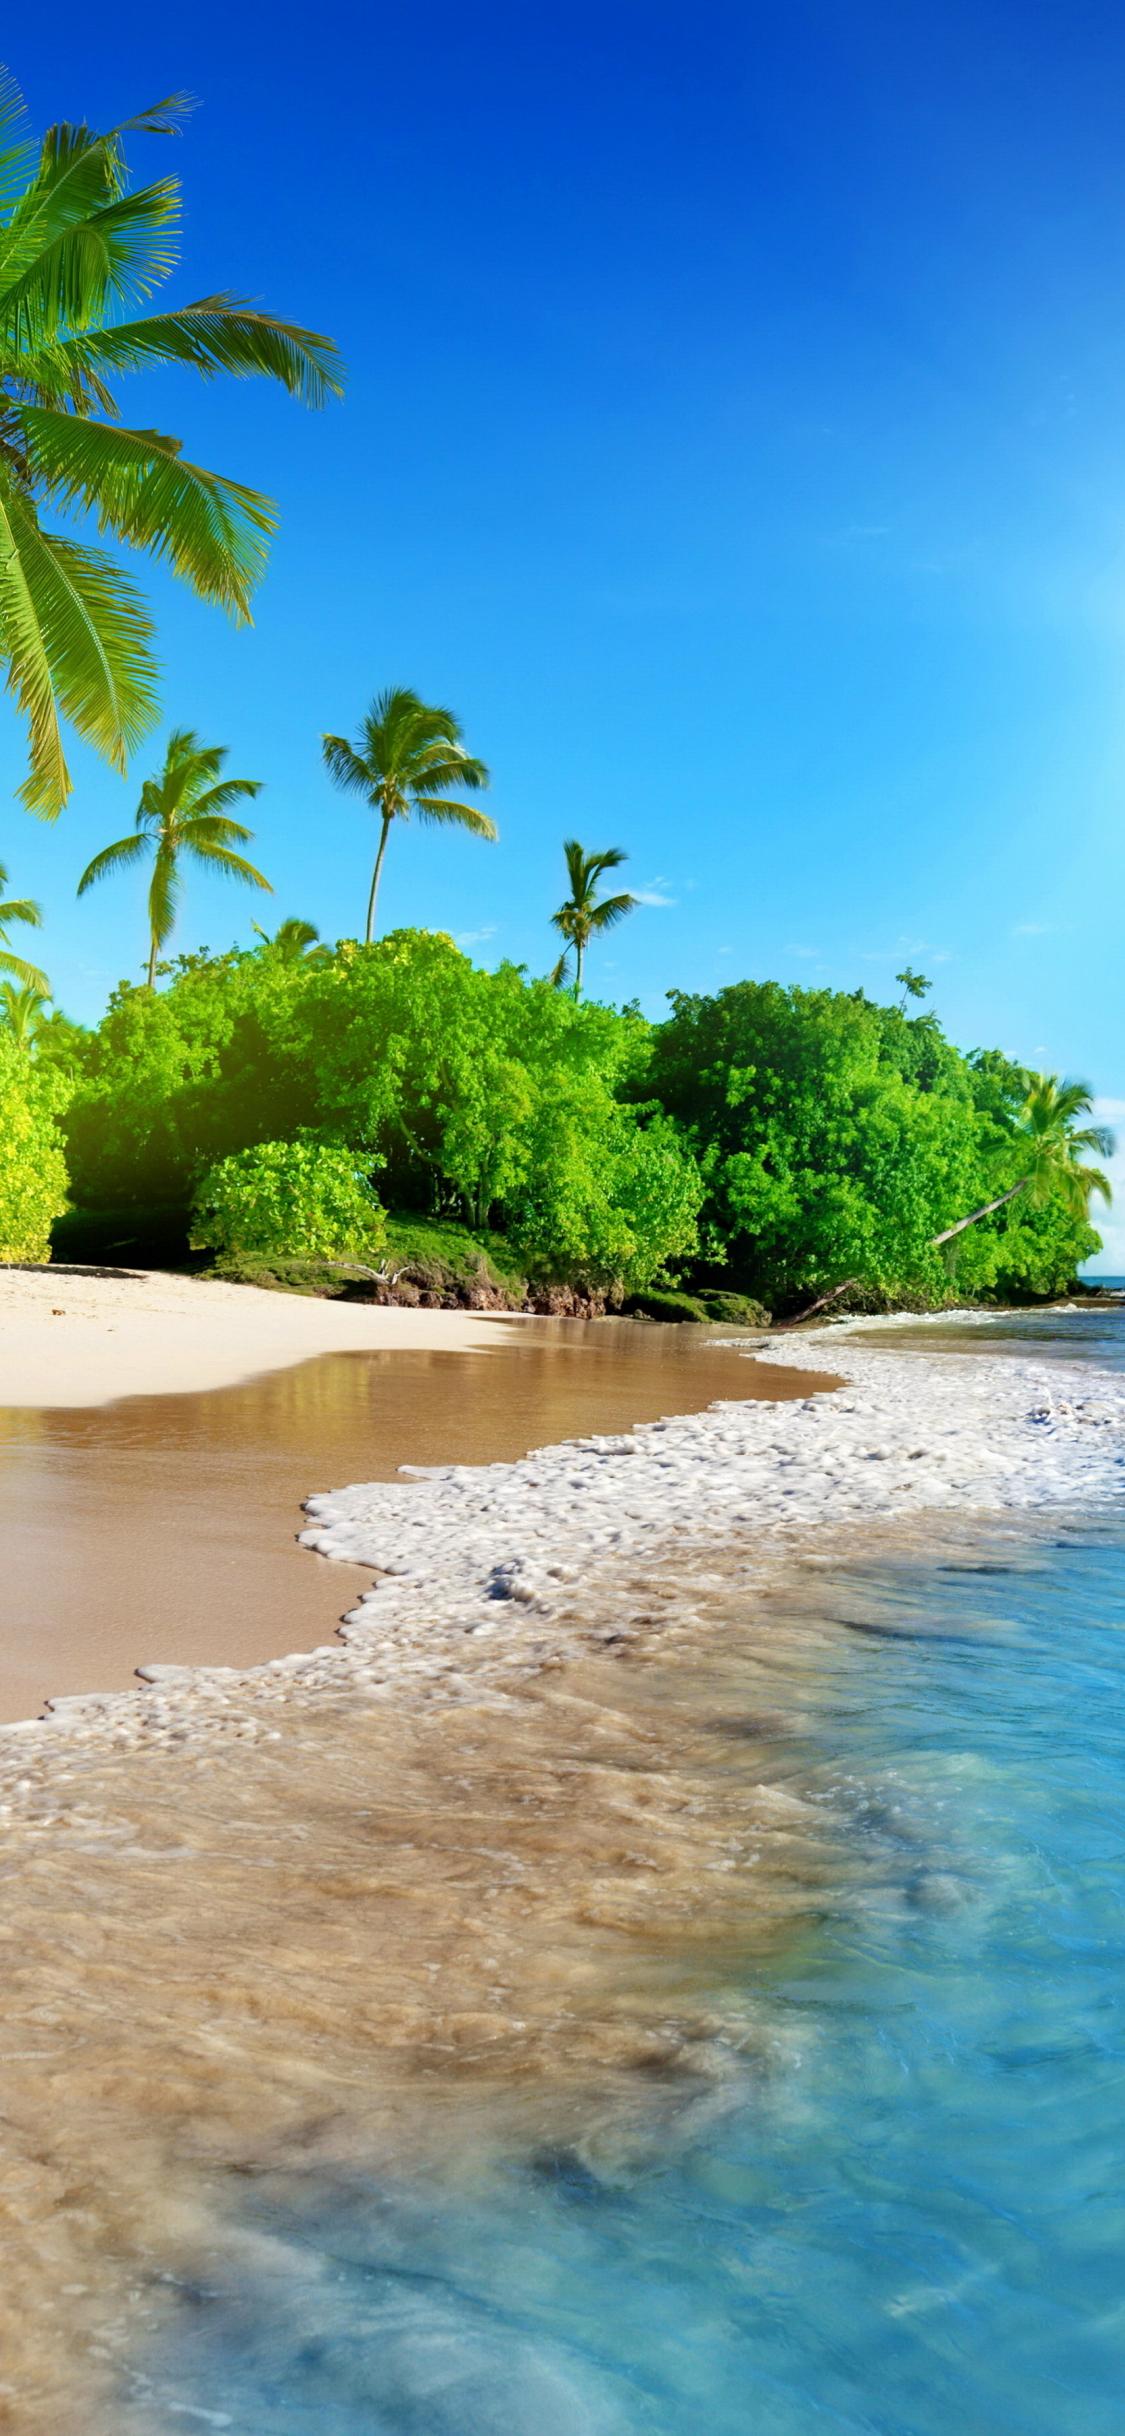 Download 1125x2436 Wallpaper Tropical Beach Sea Calm Sunny Day